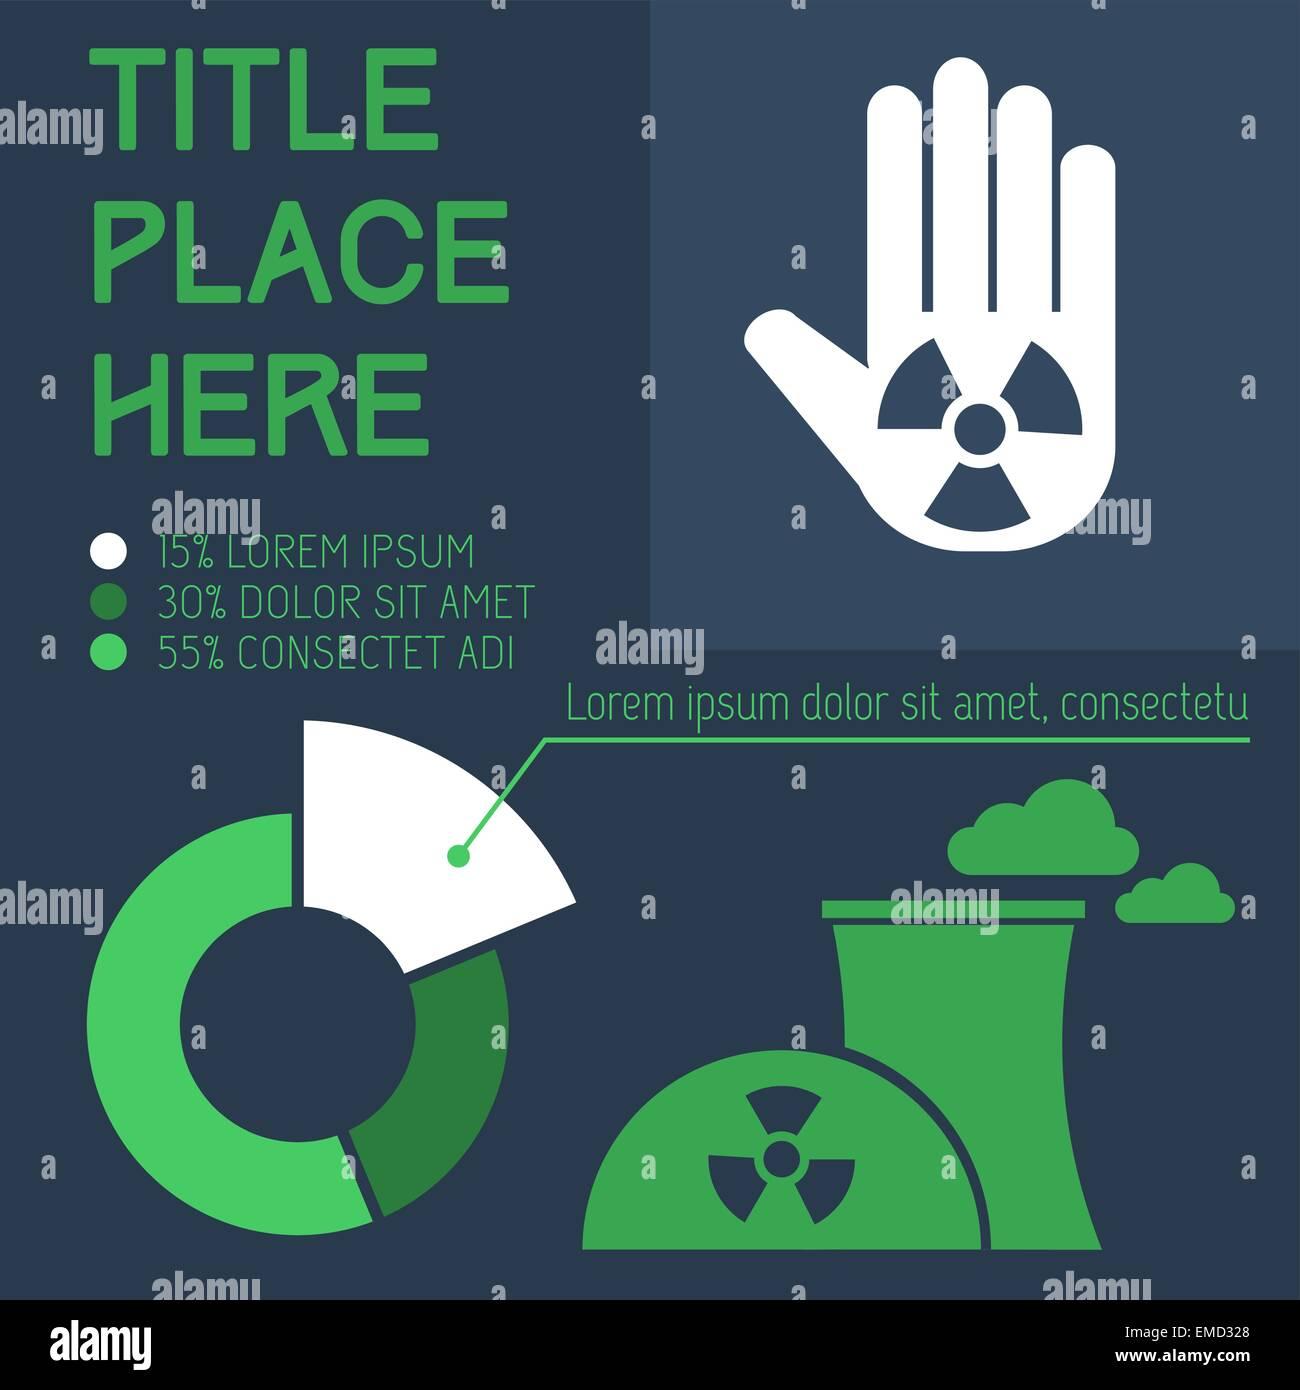 Infographic Elements. - Stock Image